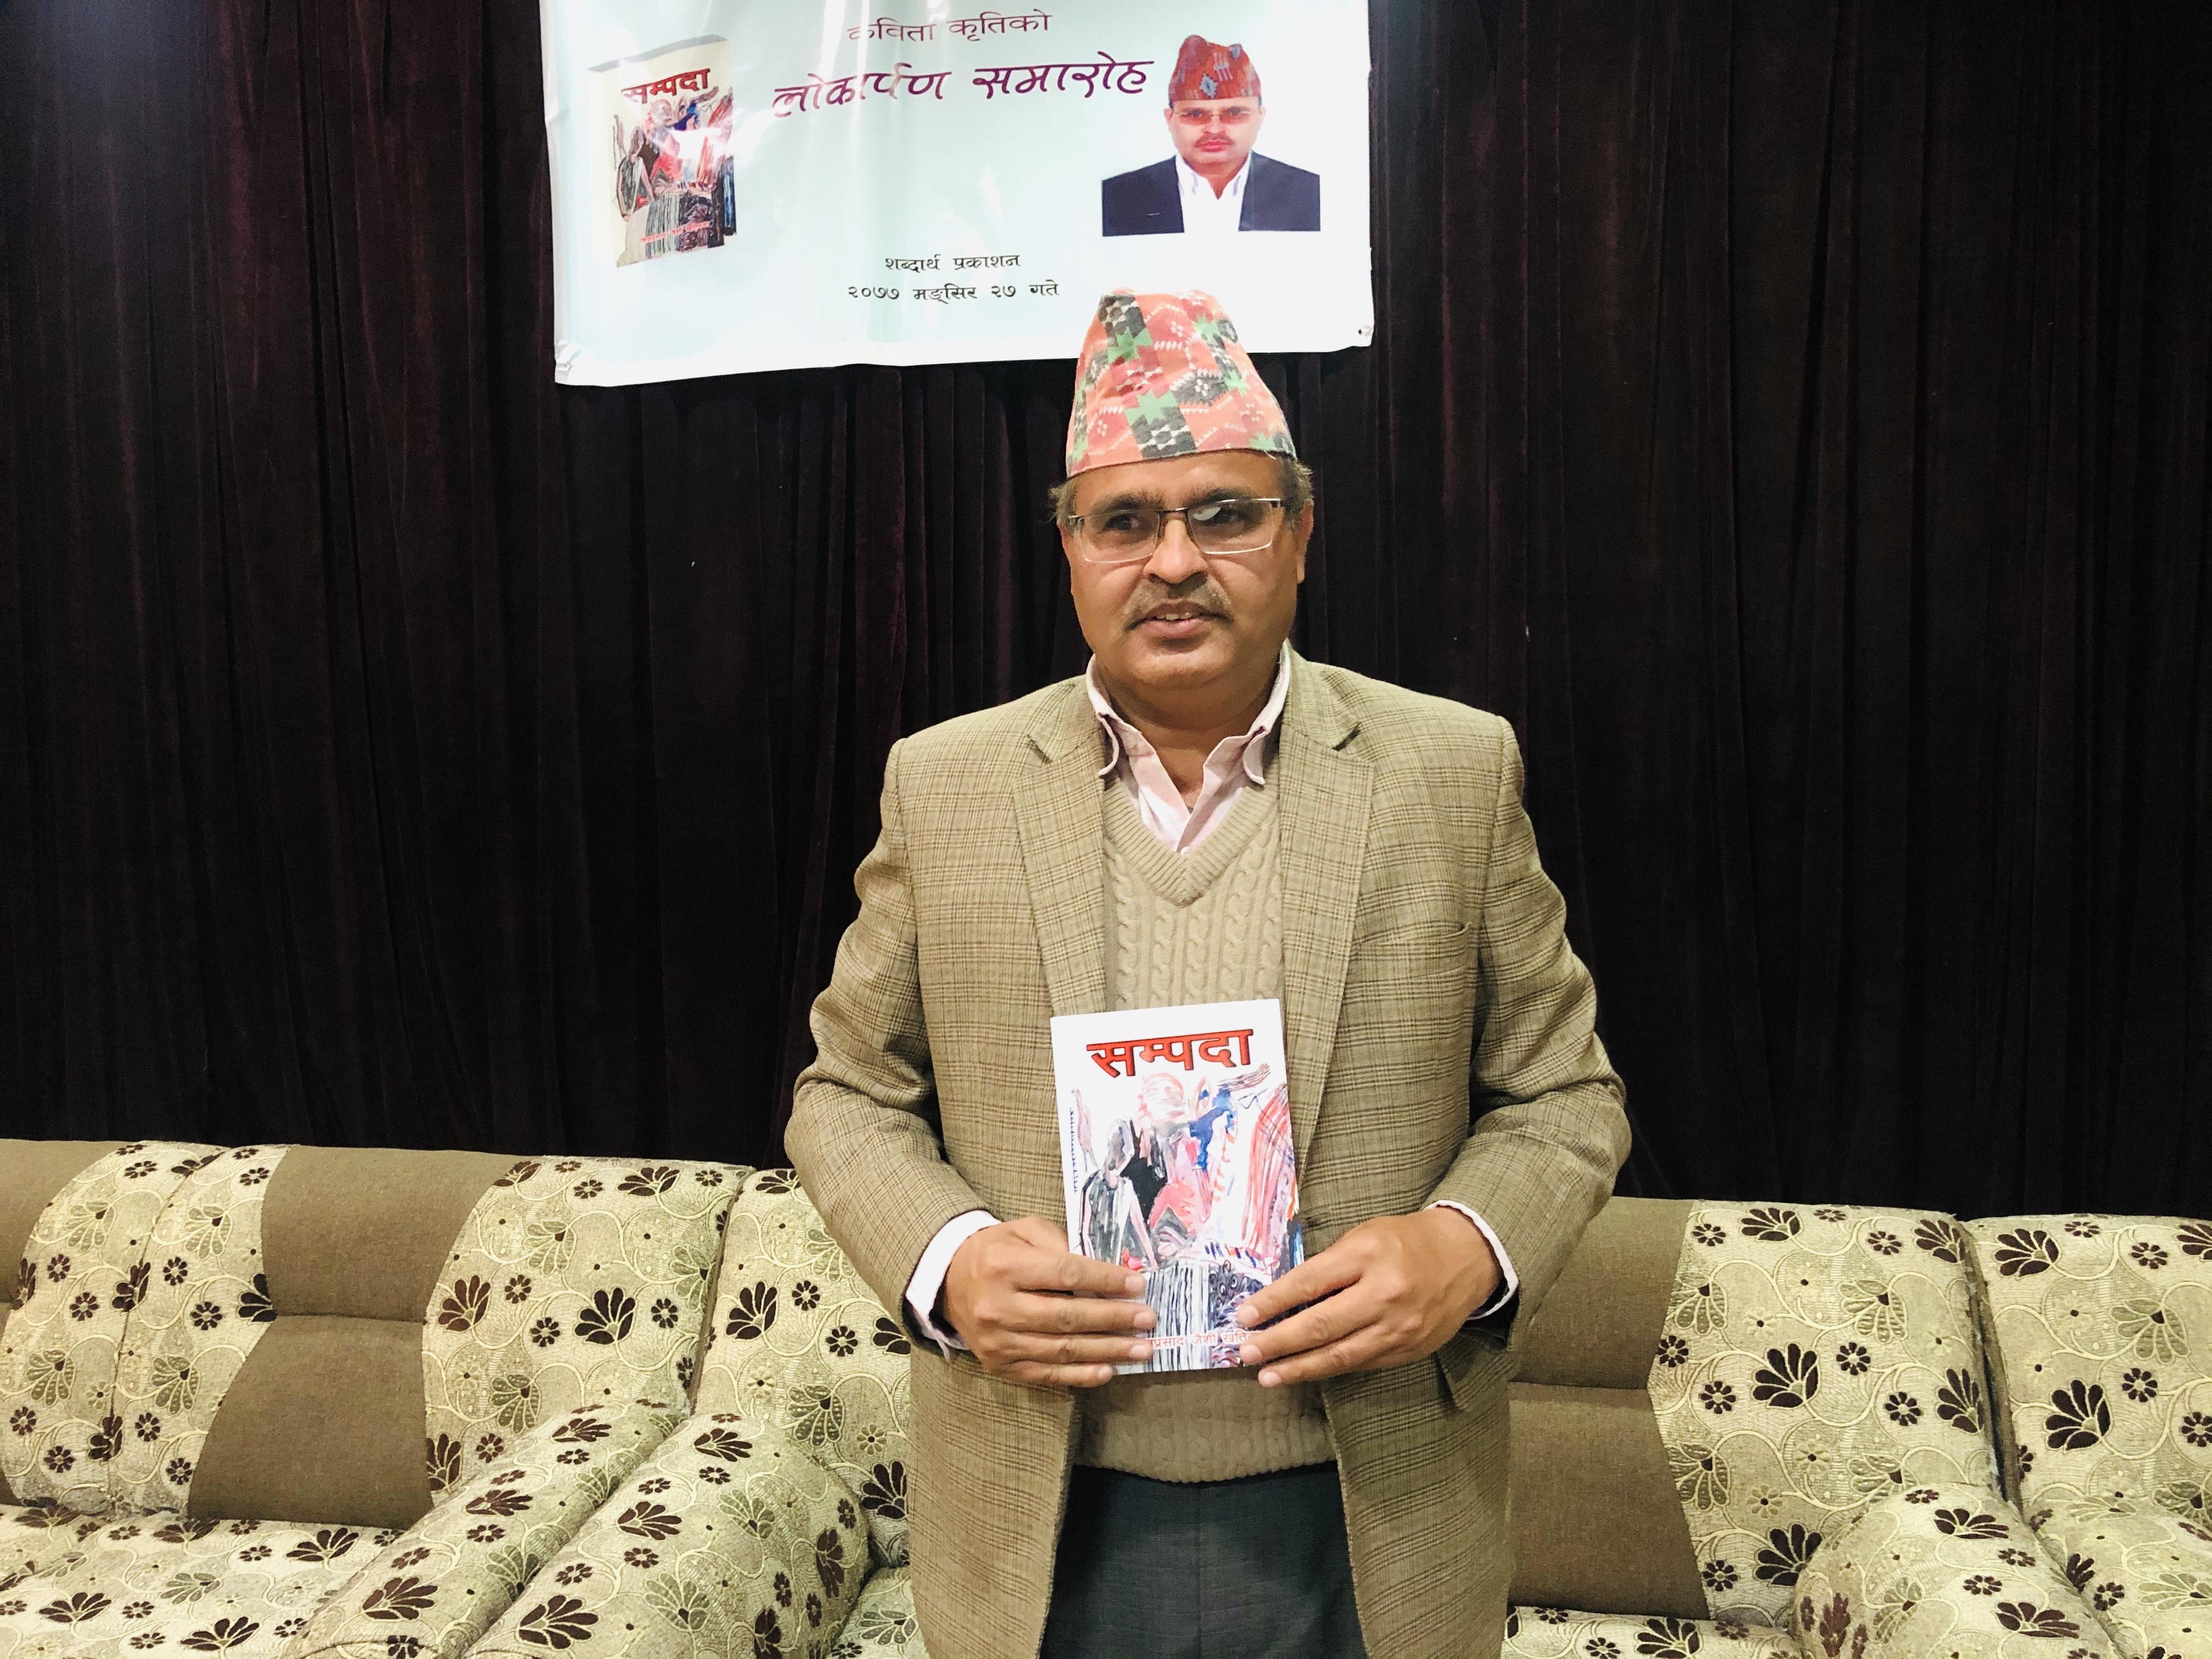 The author, Shivaprasad Jaisi Khatiwada, poses with his book. Photo: Mausam Shah Nepali/THT